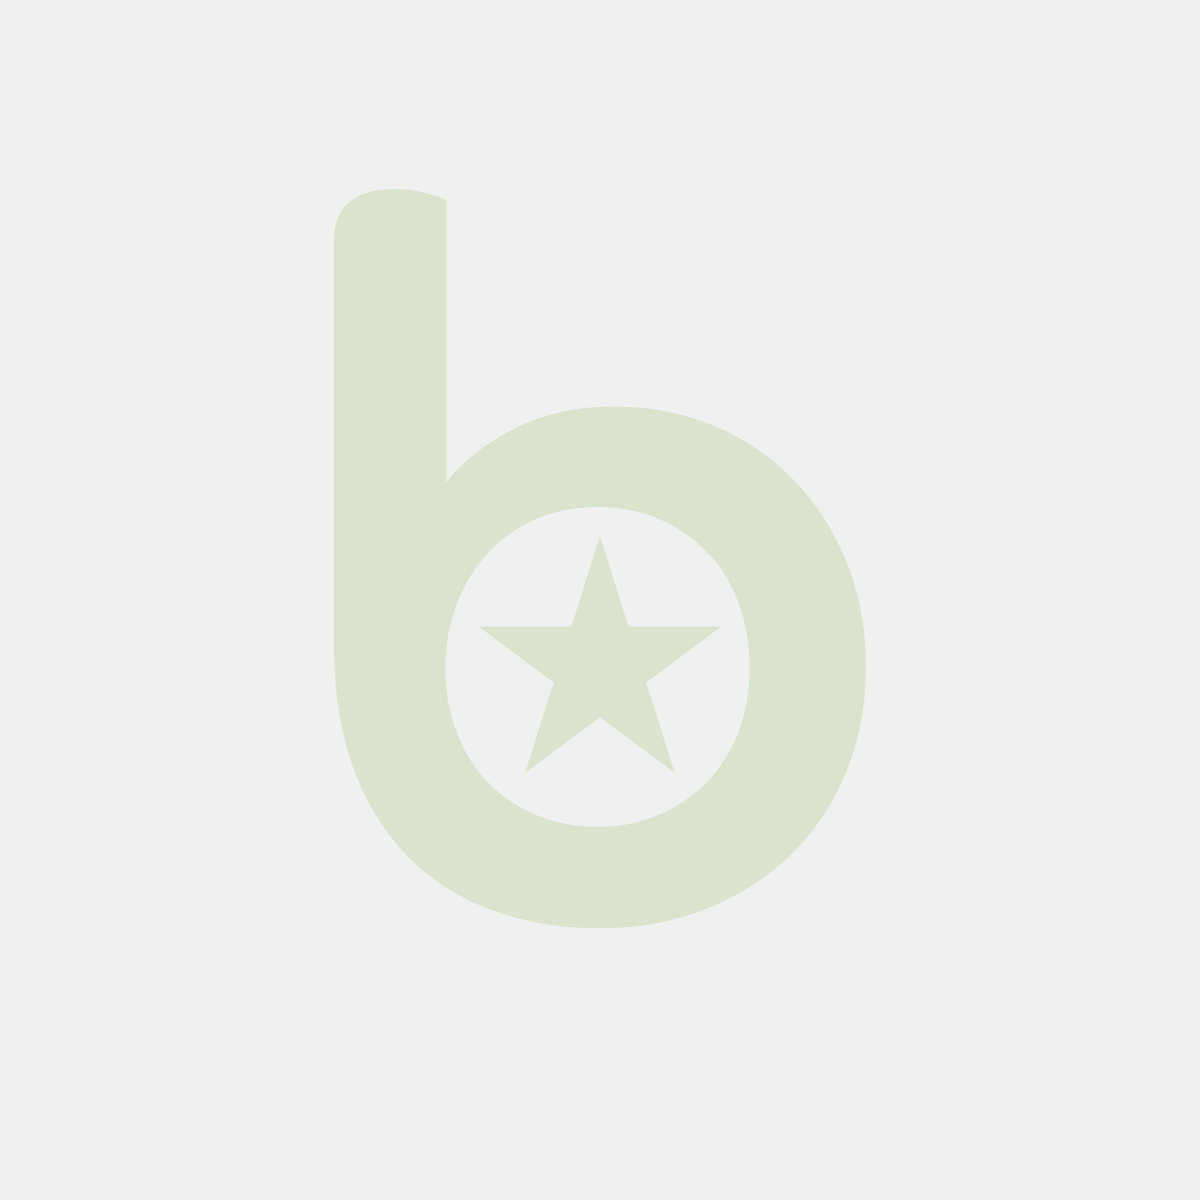 Reklamówki biodegradowalne eko 30/7/55 OK COMPOST op. 100 sztuk